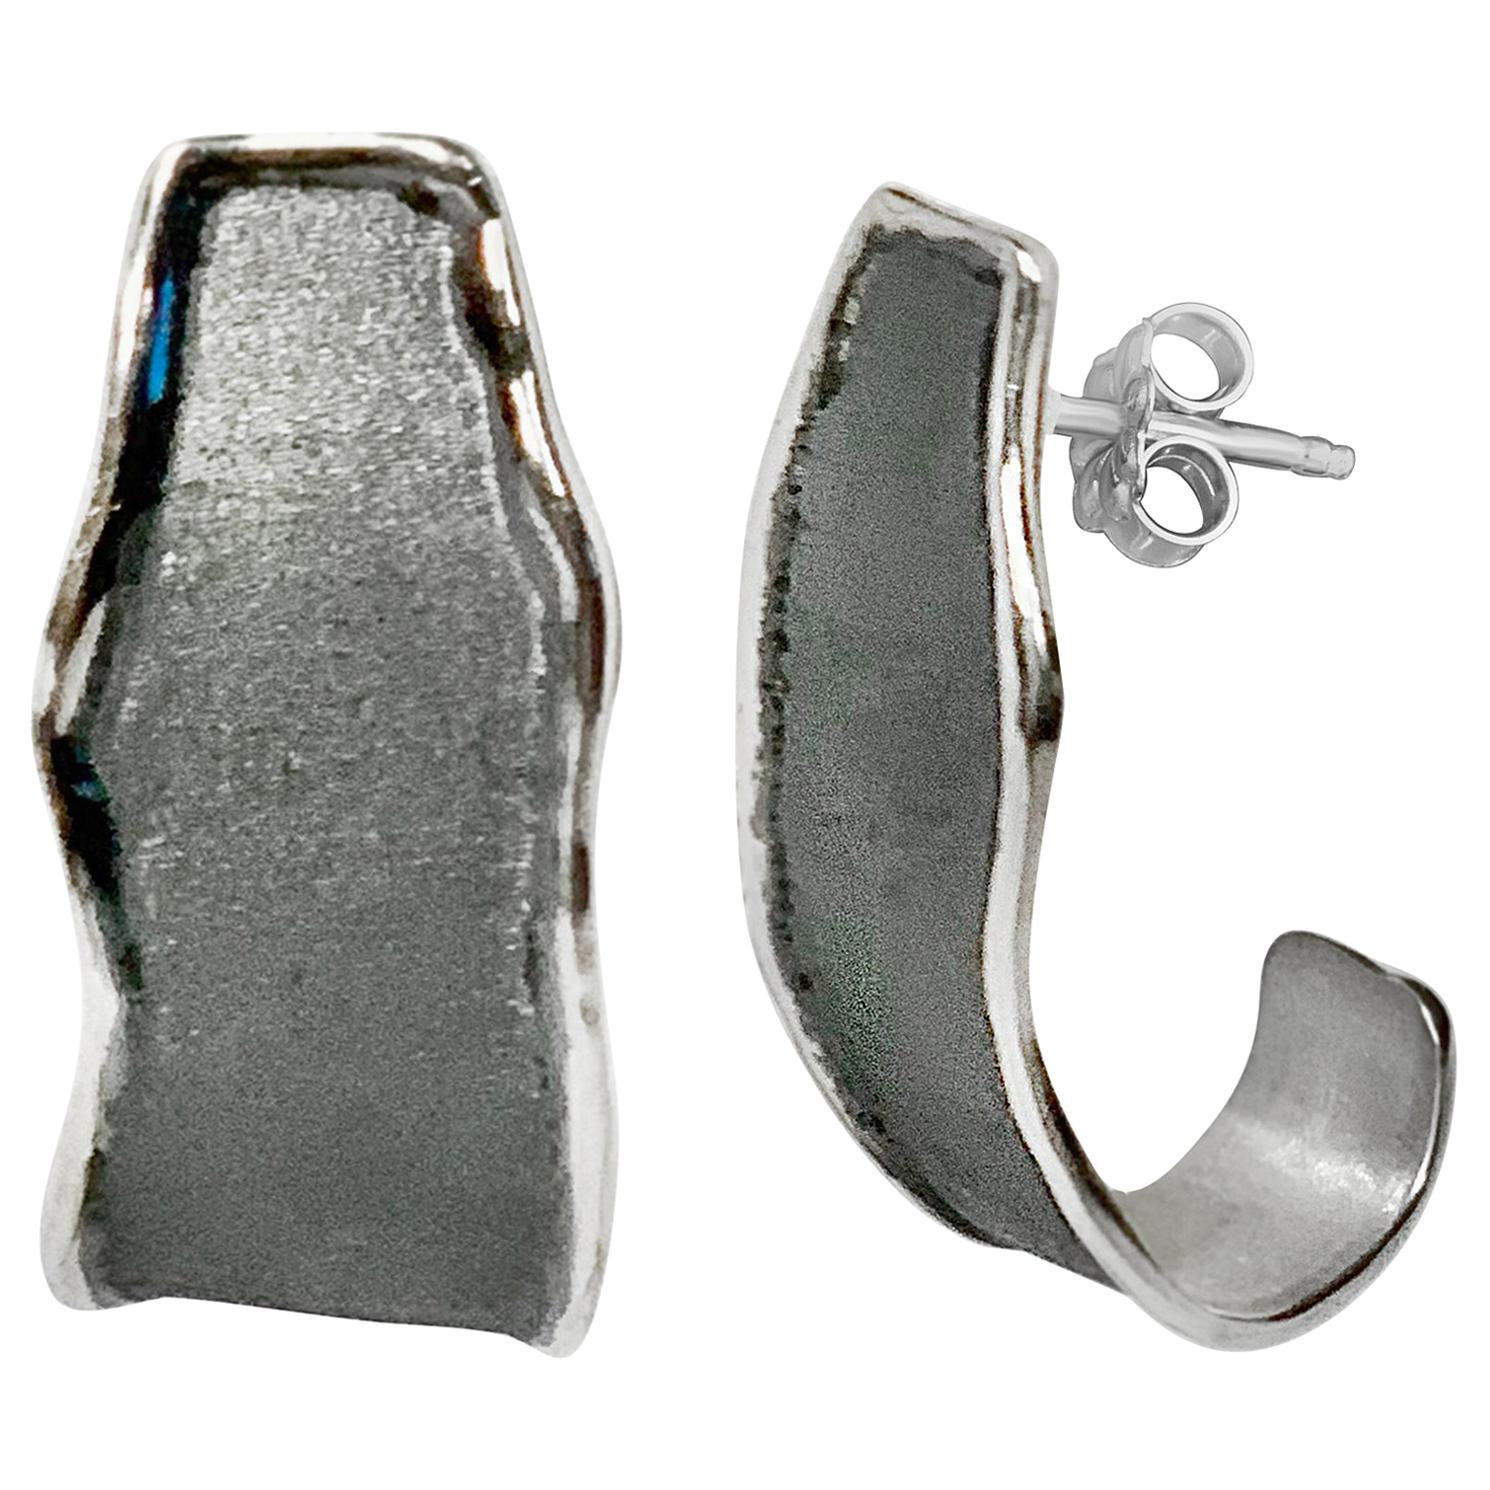 Yianni Creations Fine Silver and Black Rhodium Handmade Artisan Earrings